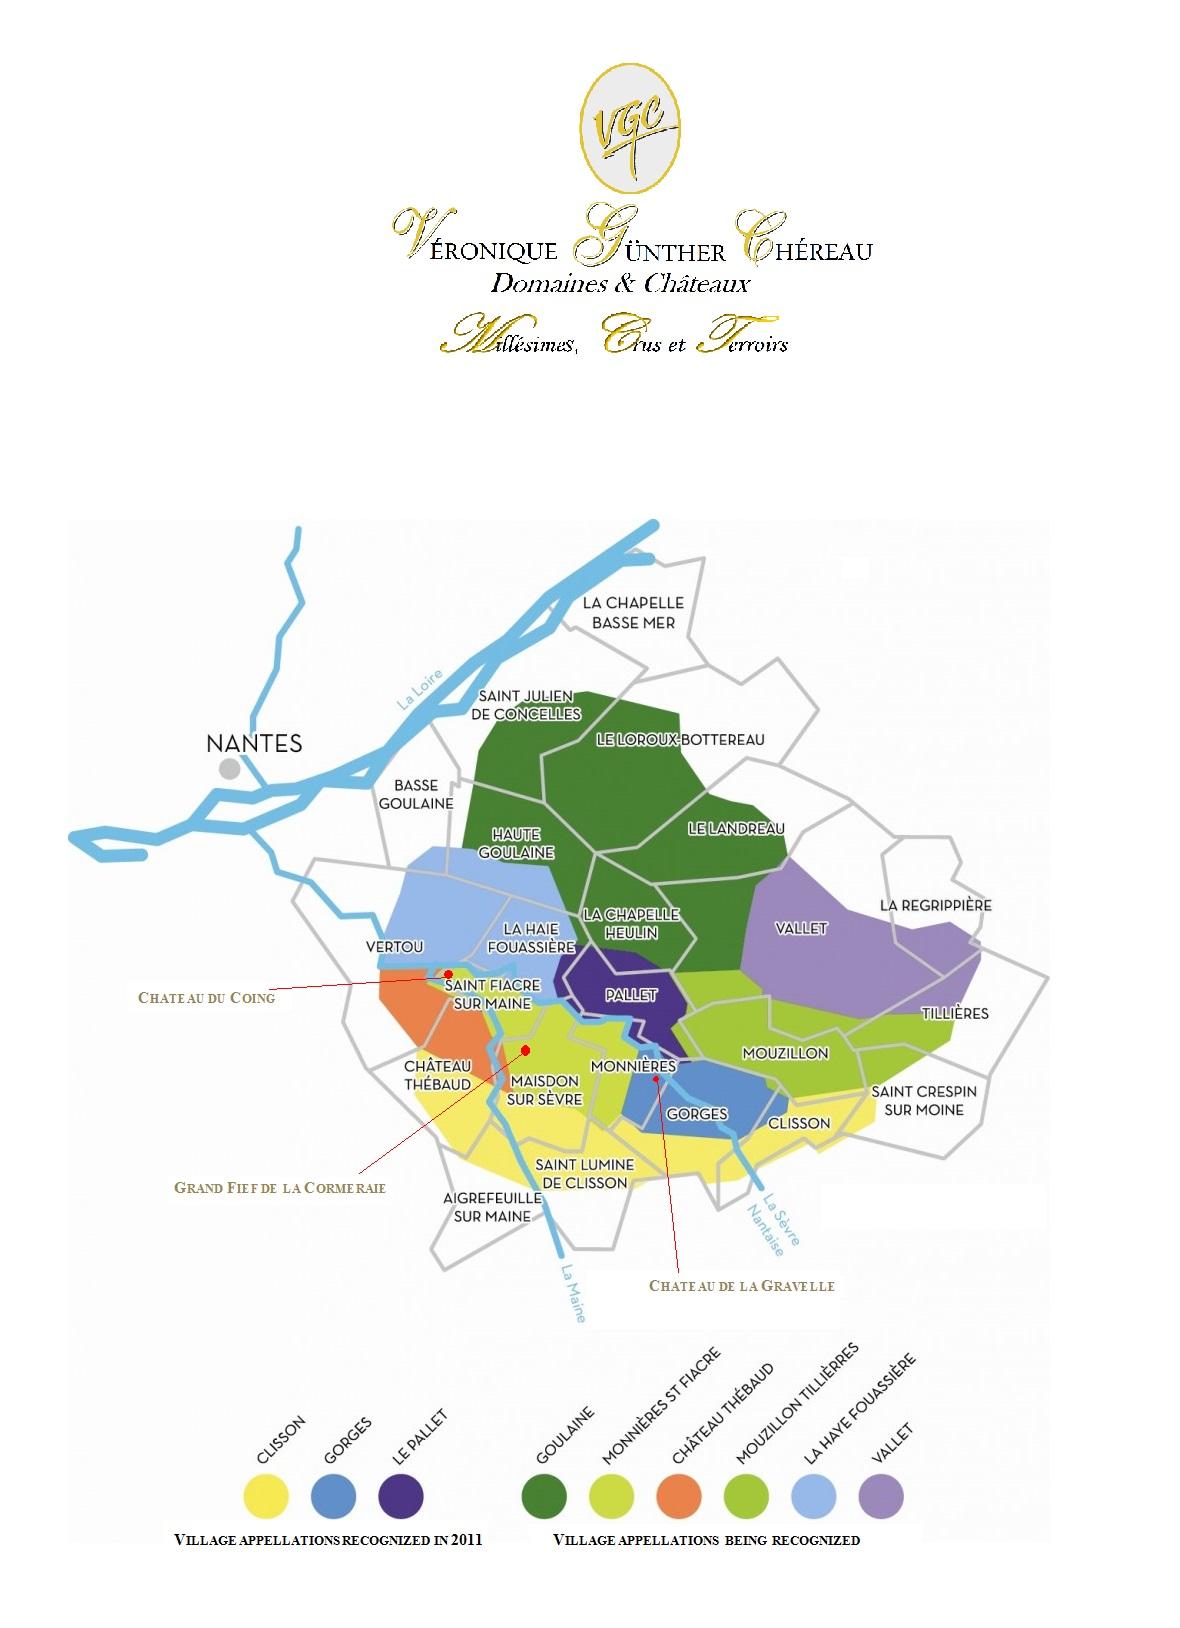 VGC estates in the Muscadet Appellation Map (www.vgc.fr)